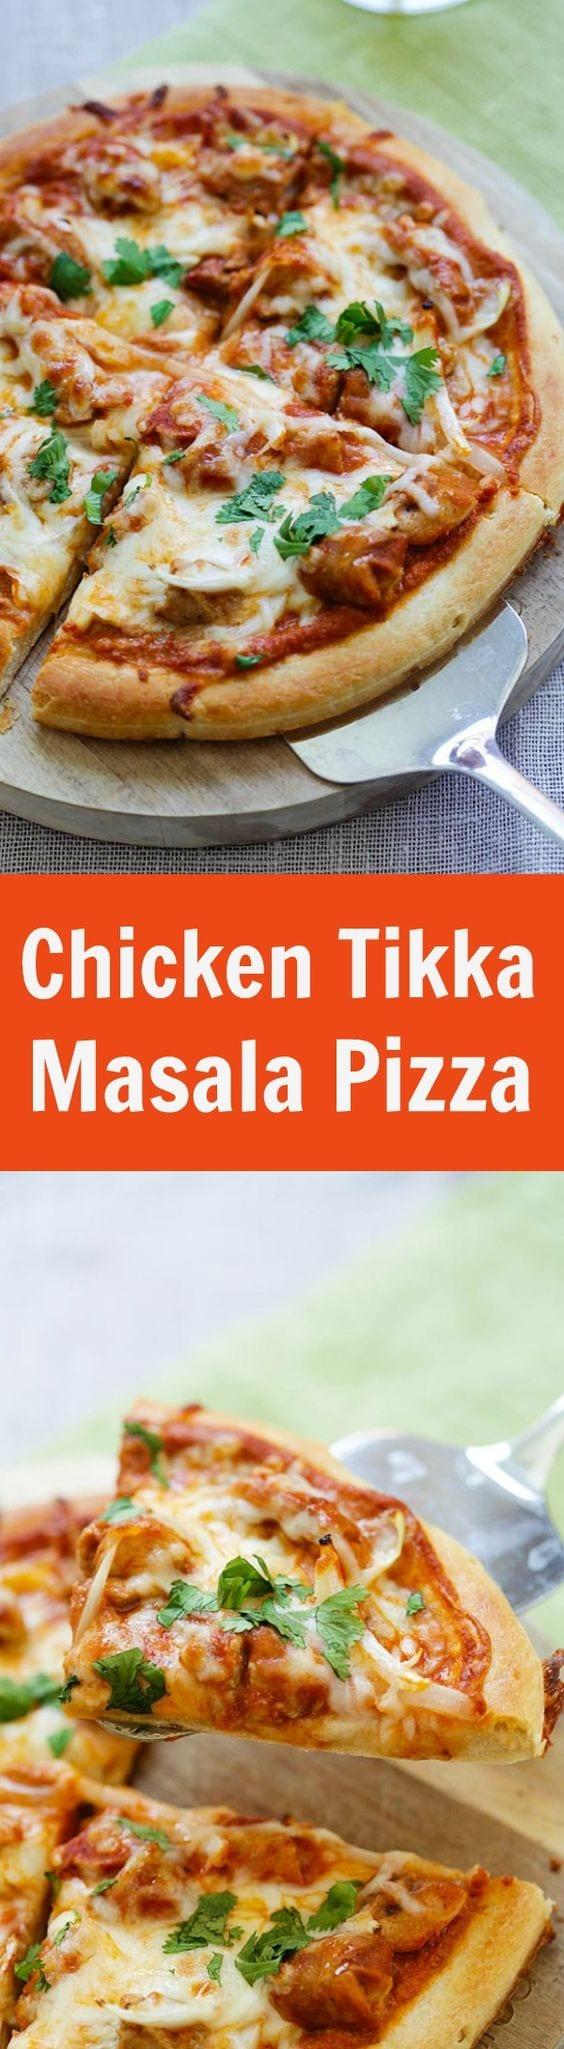 Chicken tikka masala pizza easy delicious recipes chicken tikka masala pizza cheesy pizza topped with delicious indian chicken tikka masala the forumfinder Image collections